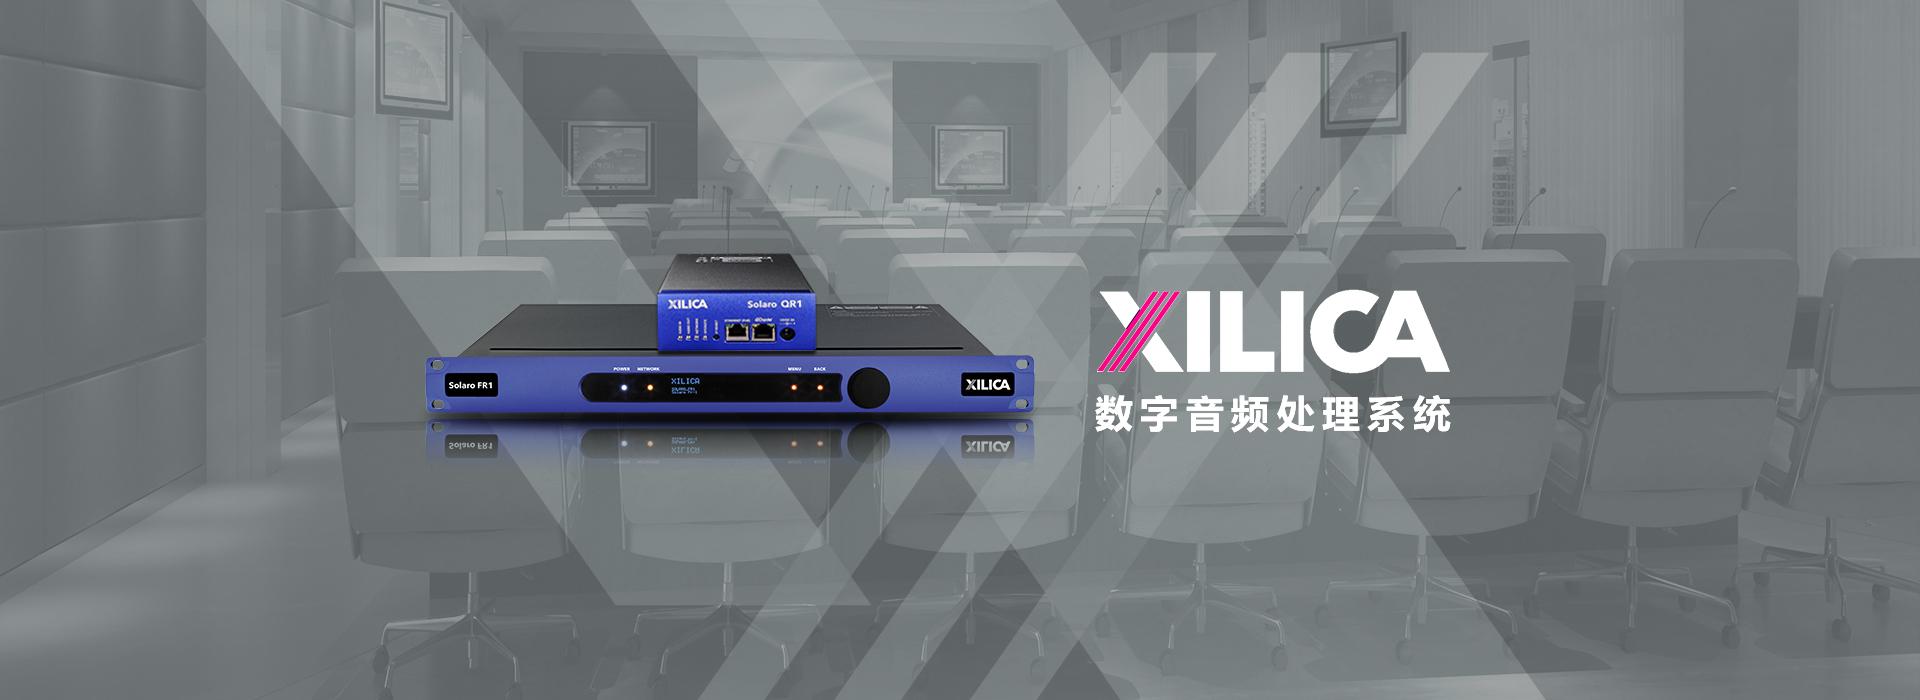 XILICA音频处理器